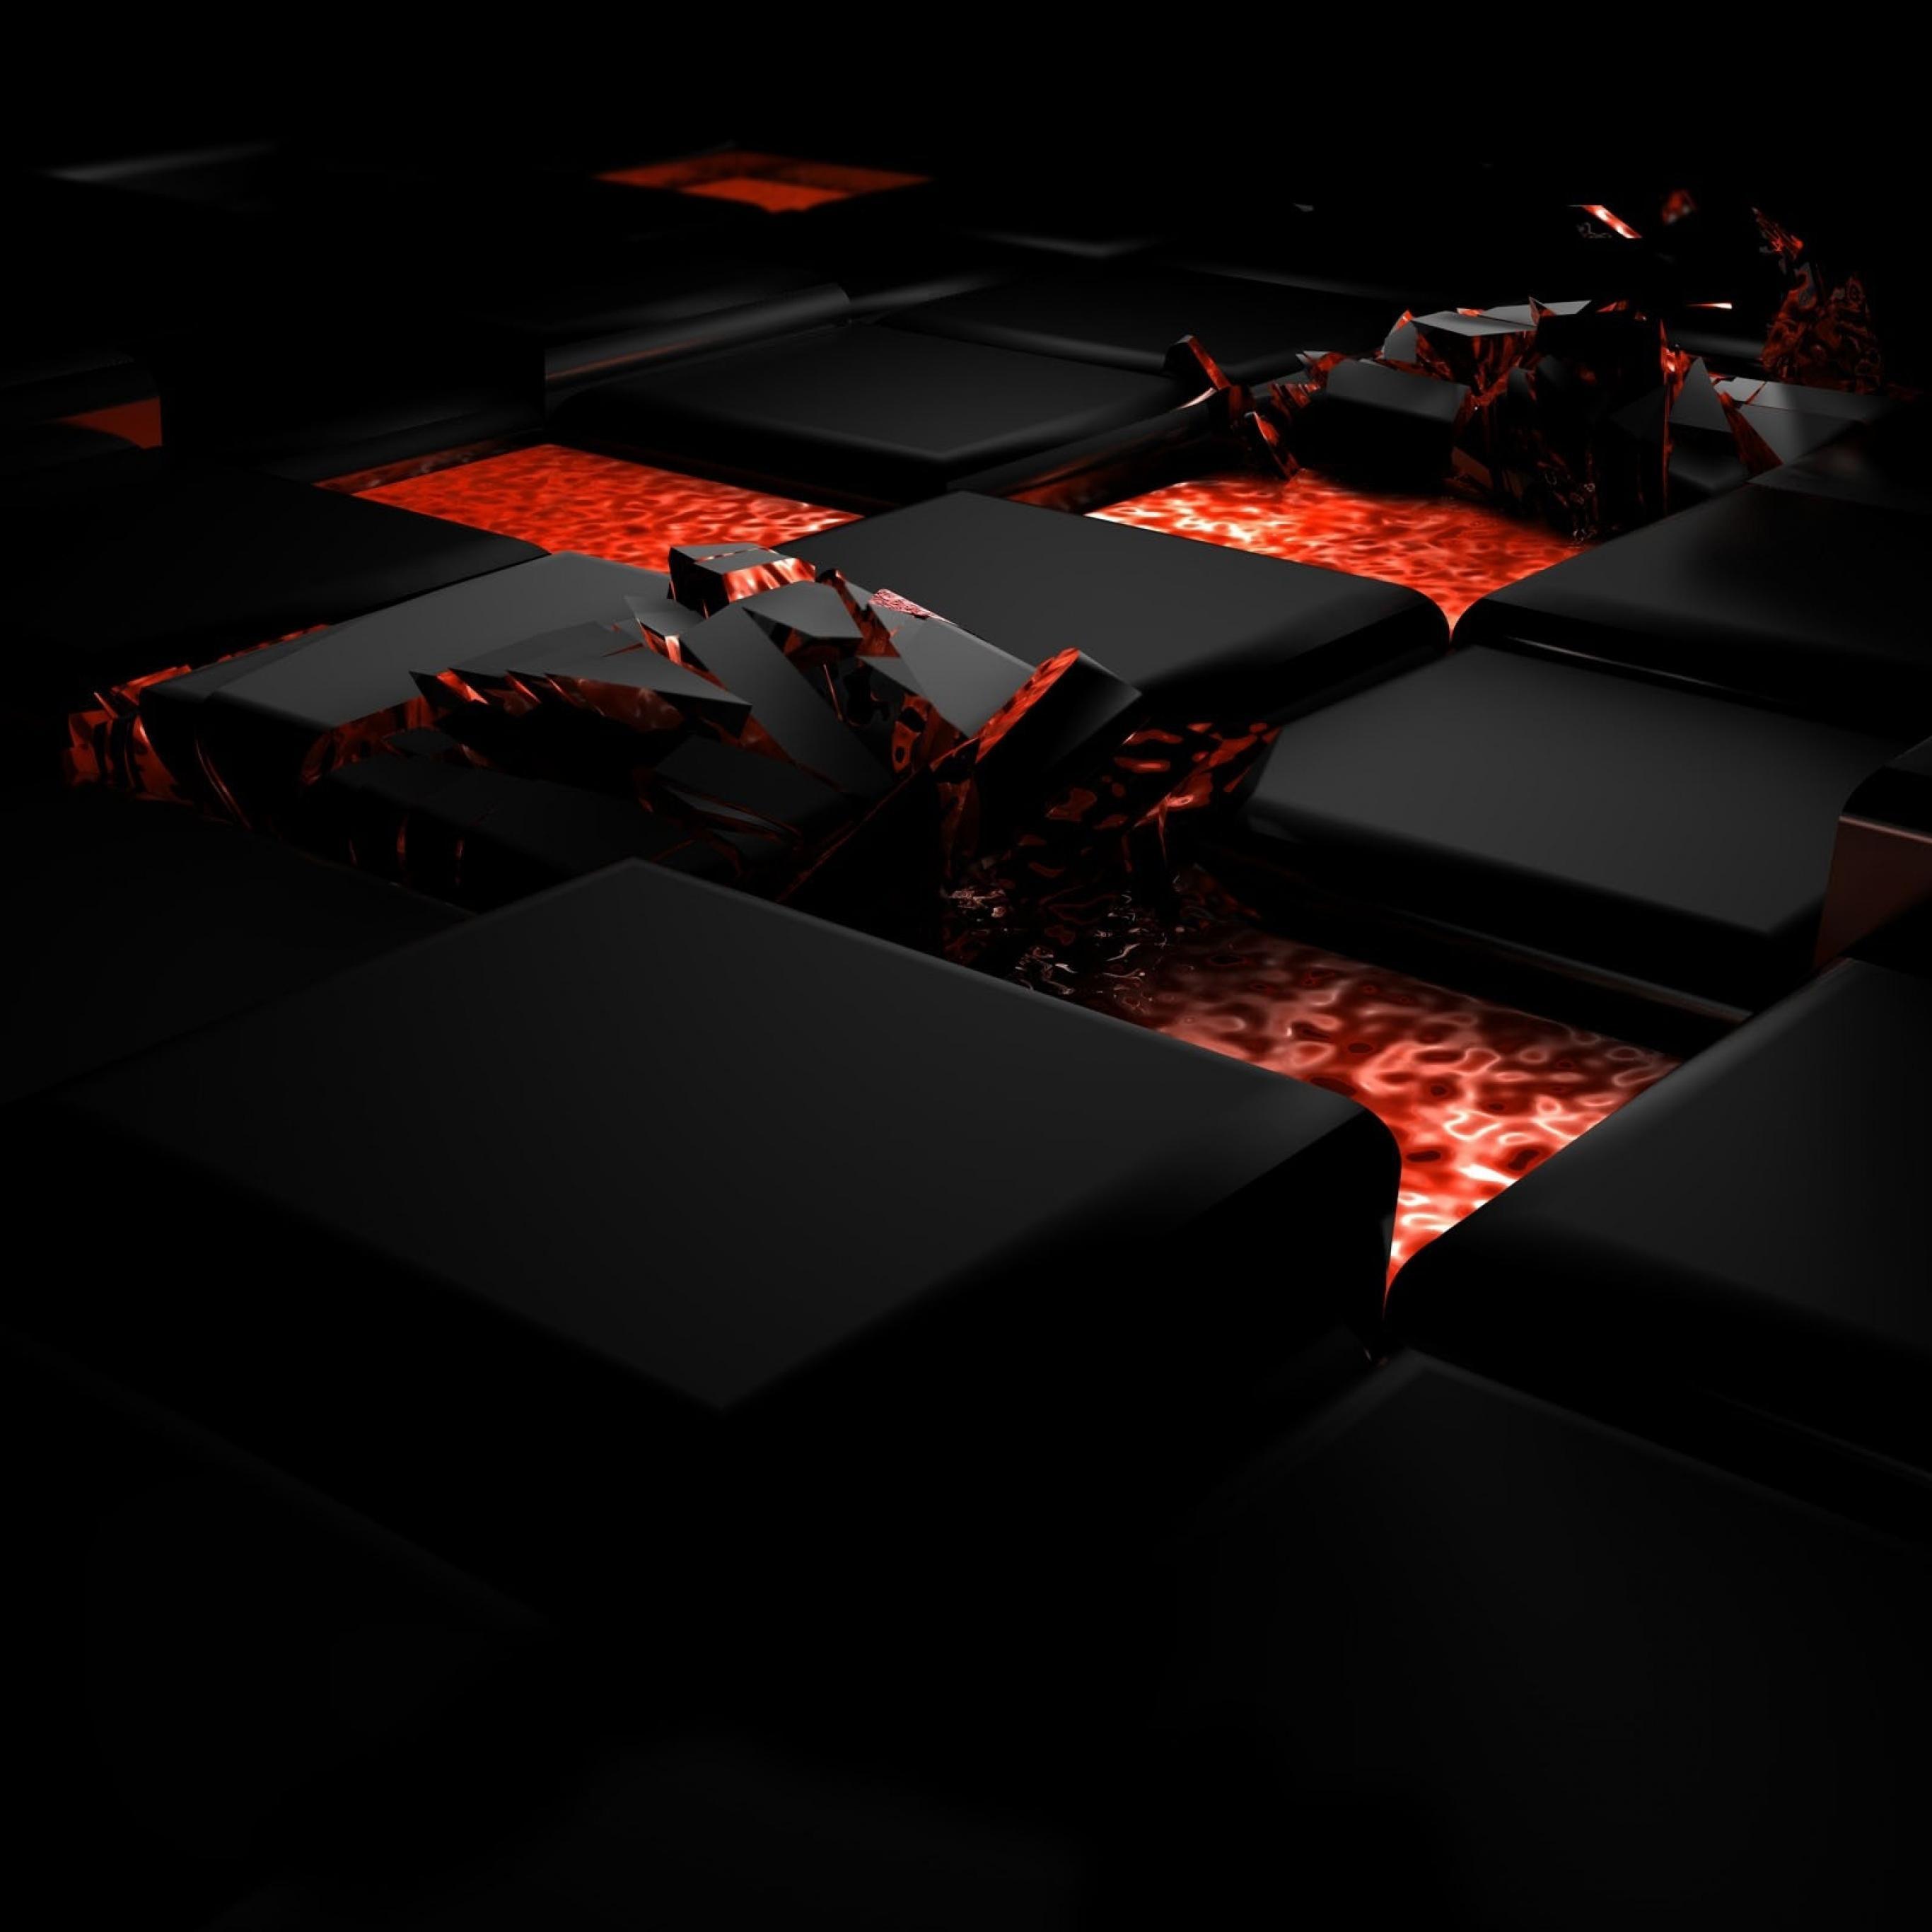 Black Live Wallpaper, AMOLED, Dark 4K HD : Darknex for ...